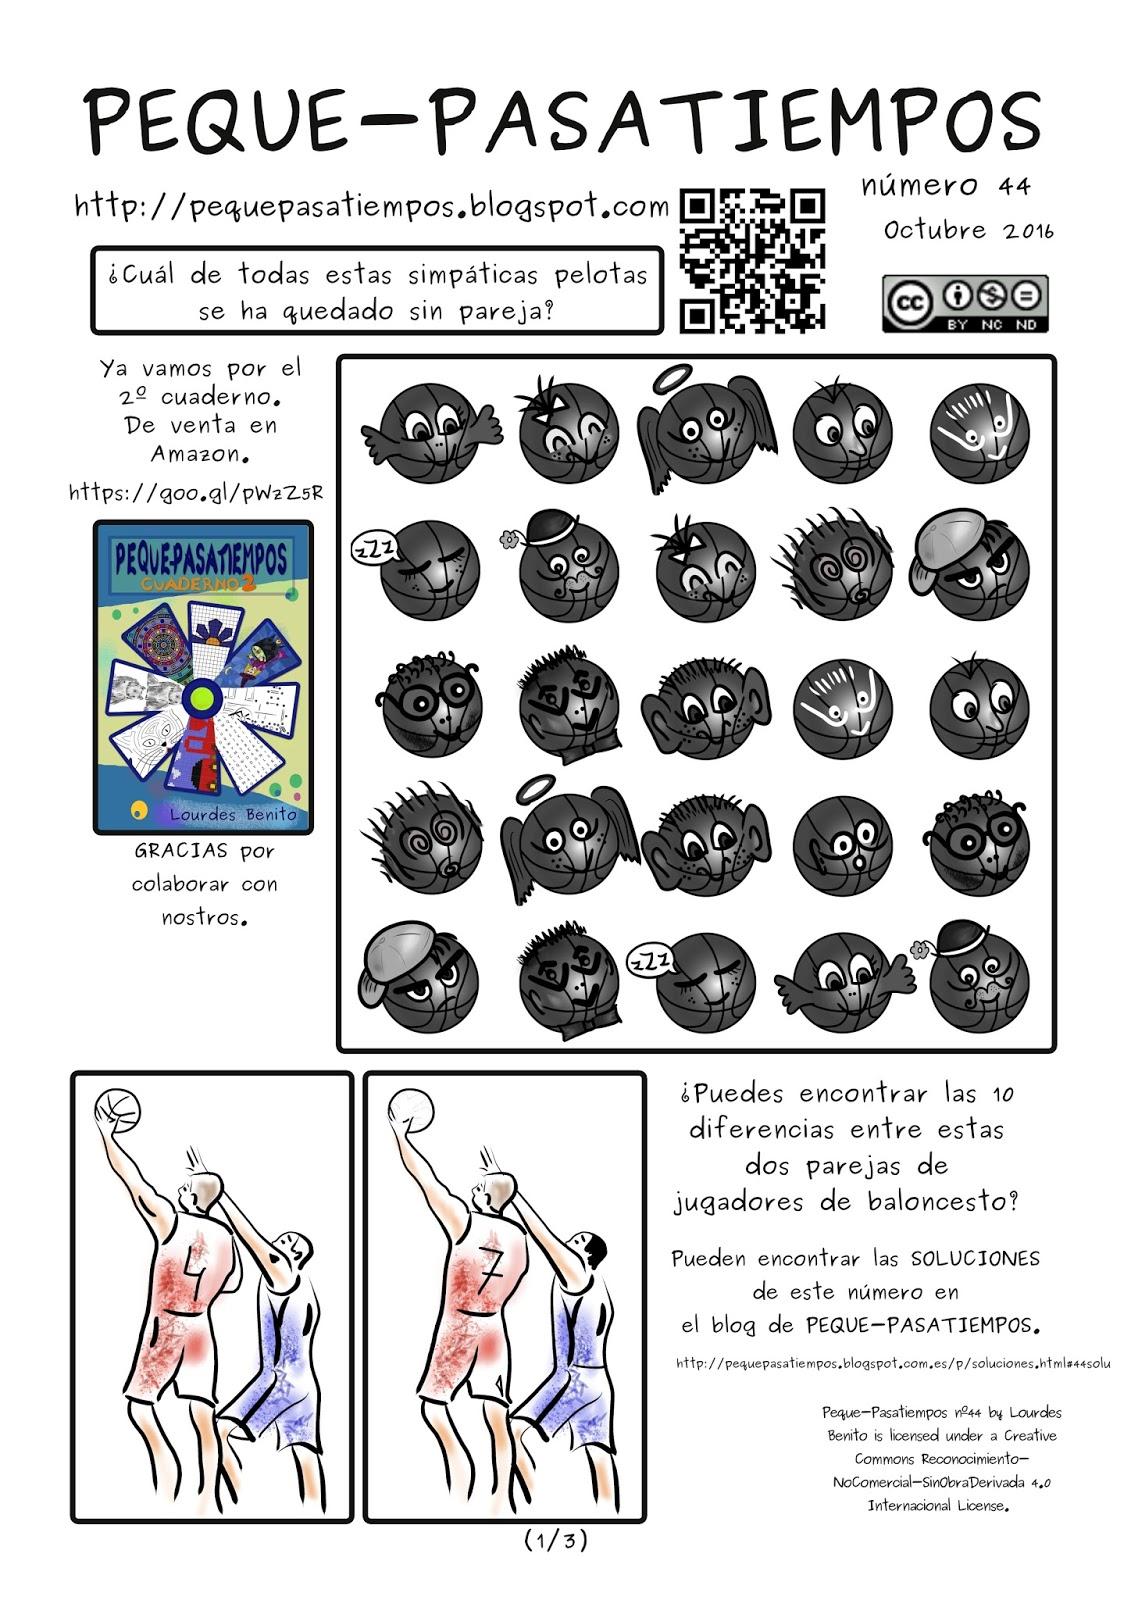 Peque-pasatiempos: PEQUE-PASATIEMPOS nº44